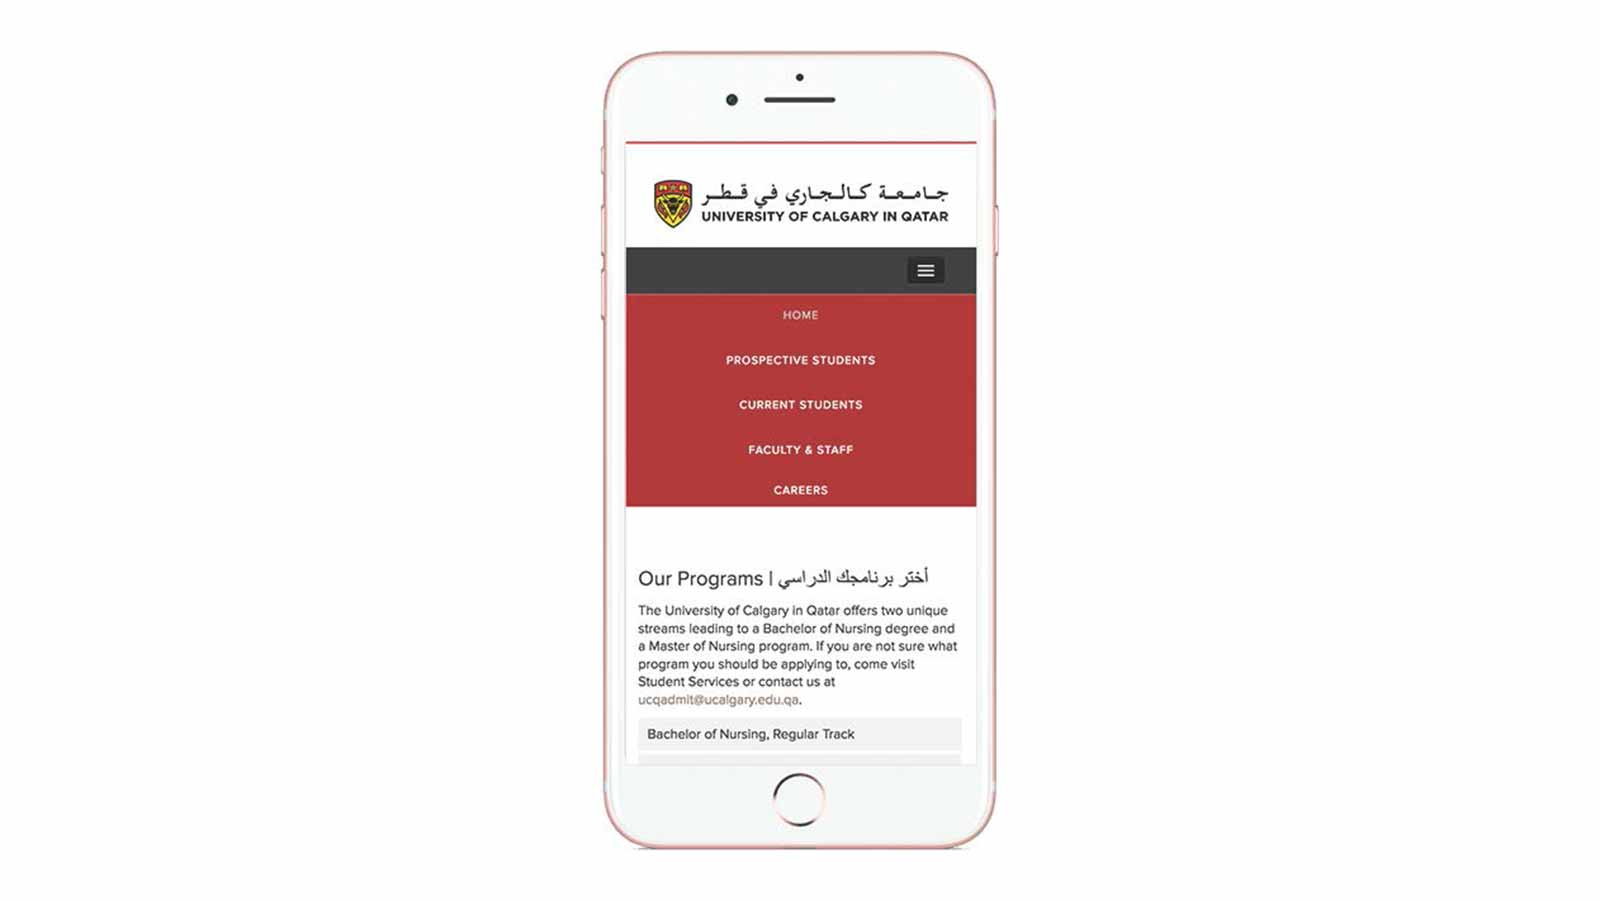 University of Calgary in Qatar Digital Support